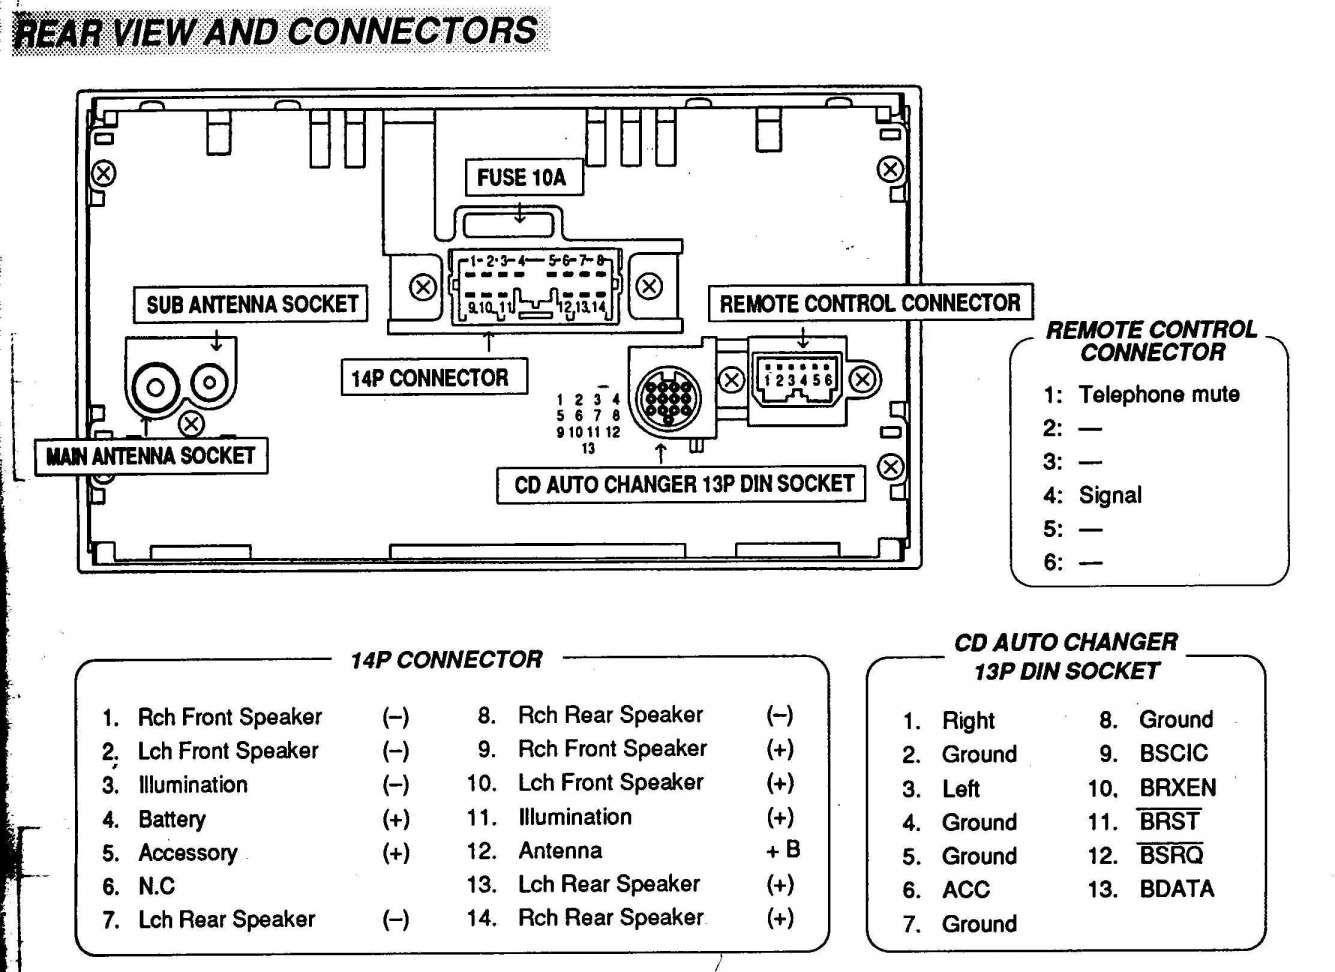 10 Bose Car Audio Wiring Diagram Mitsubishi Cars Electrical Wiring Diagram Car Stereo